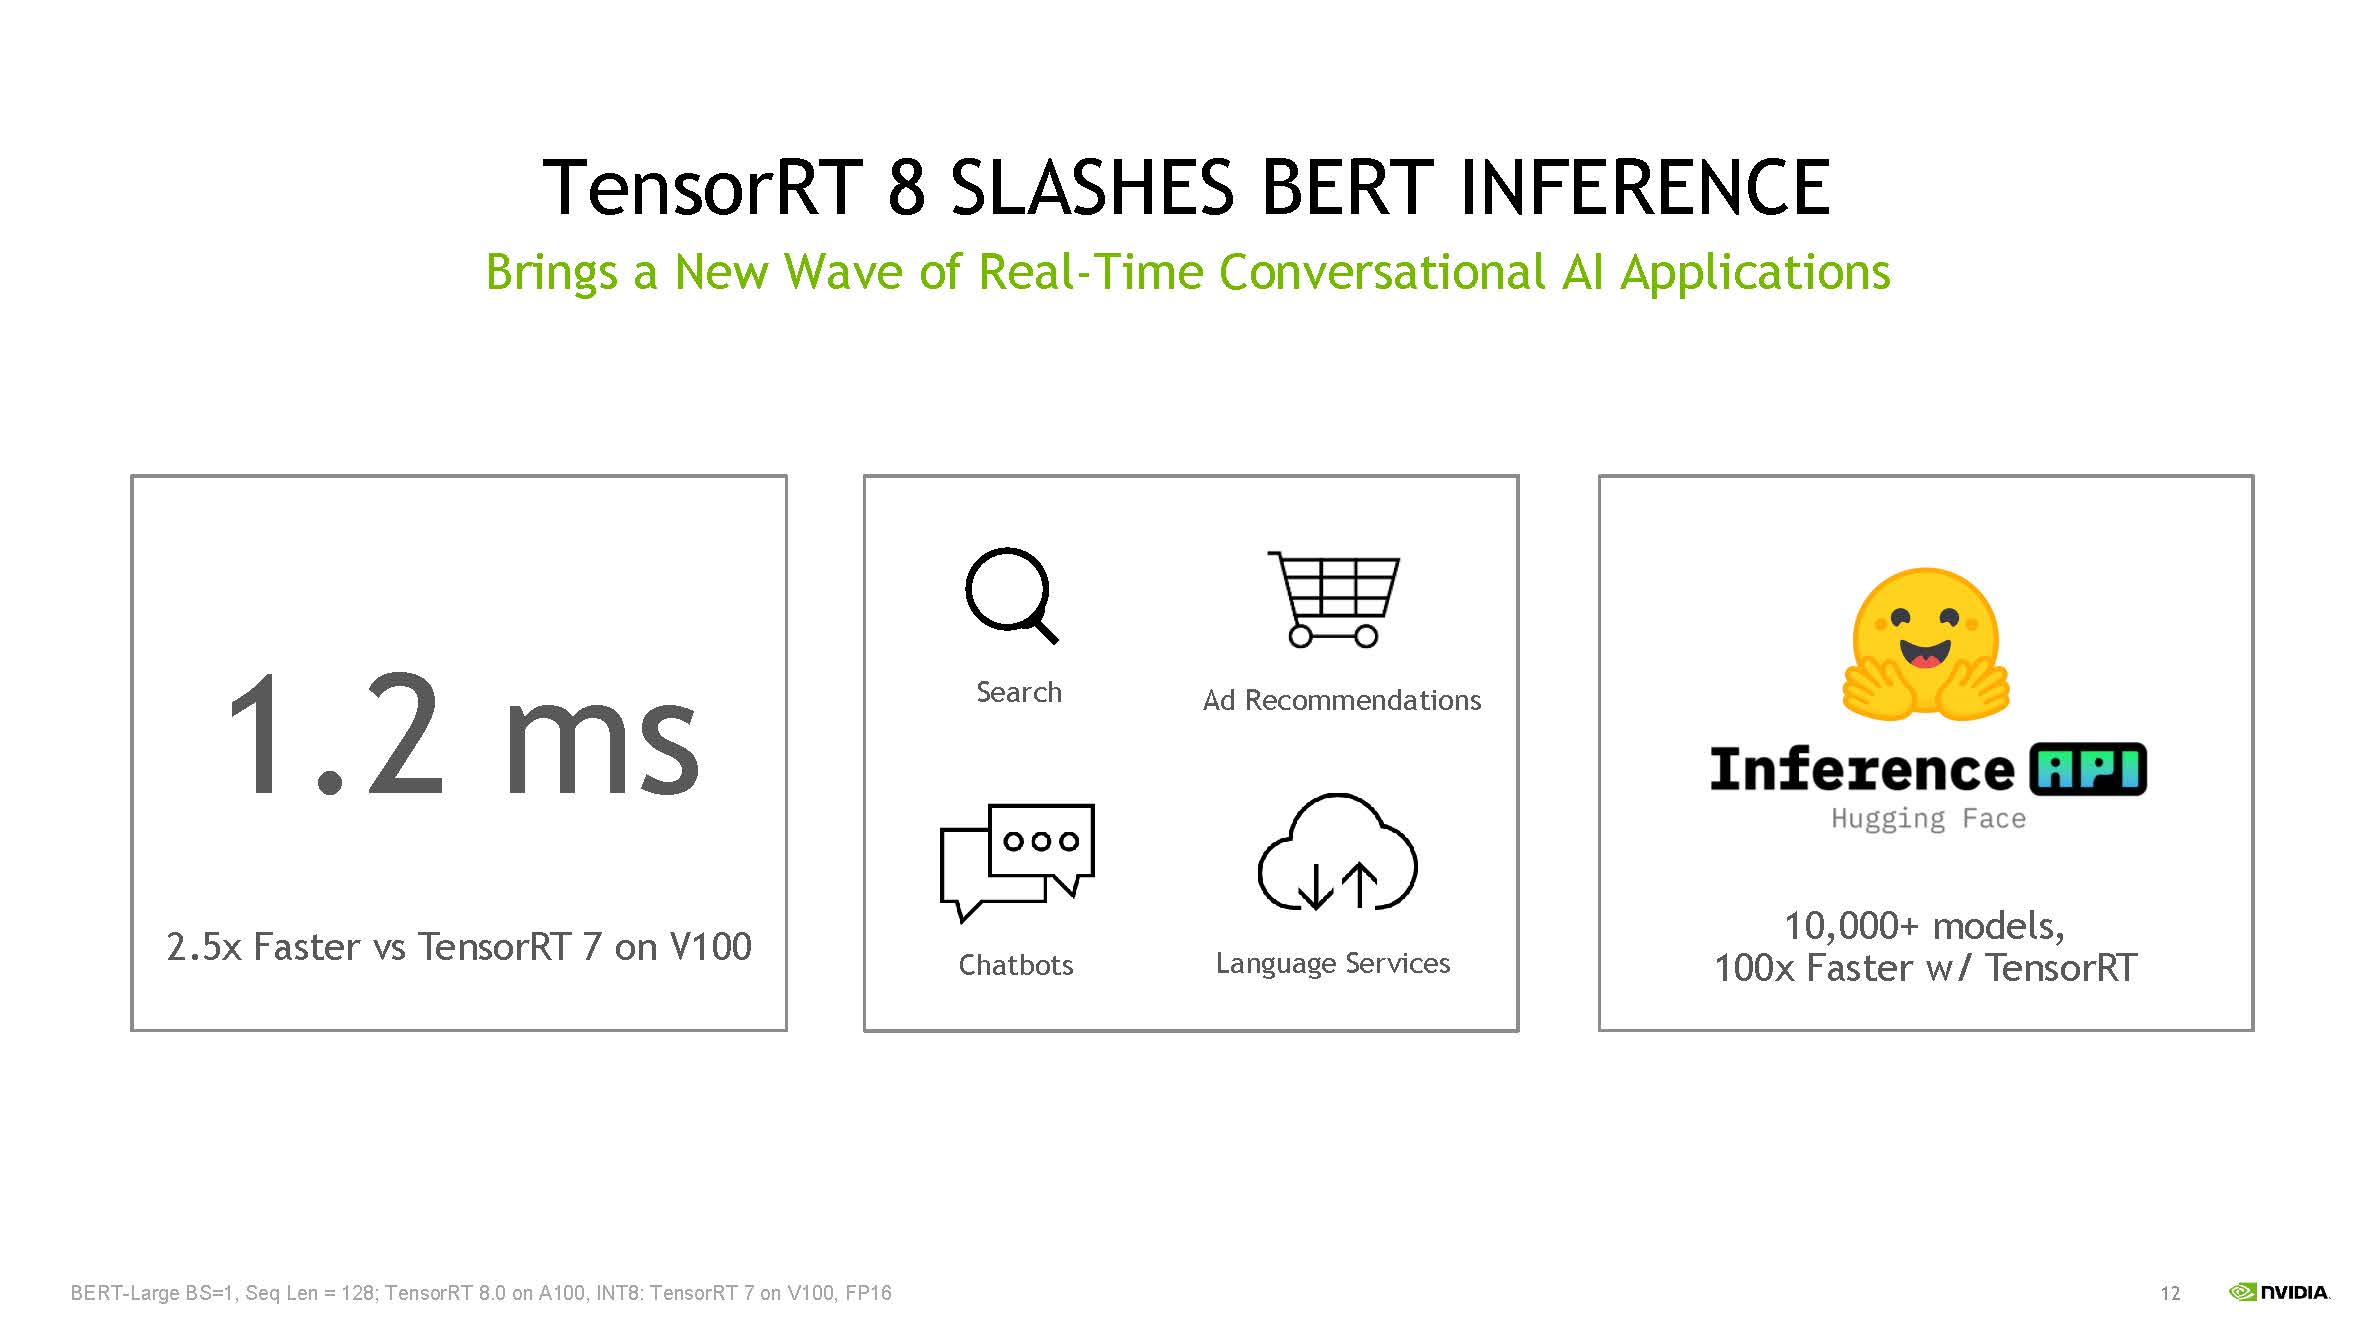 NVIDIA TensorRT 8 And RecSys BERT Inference